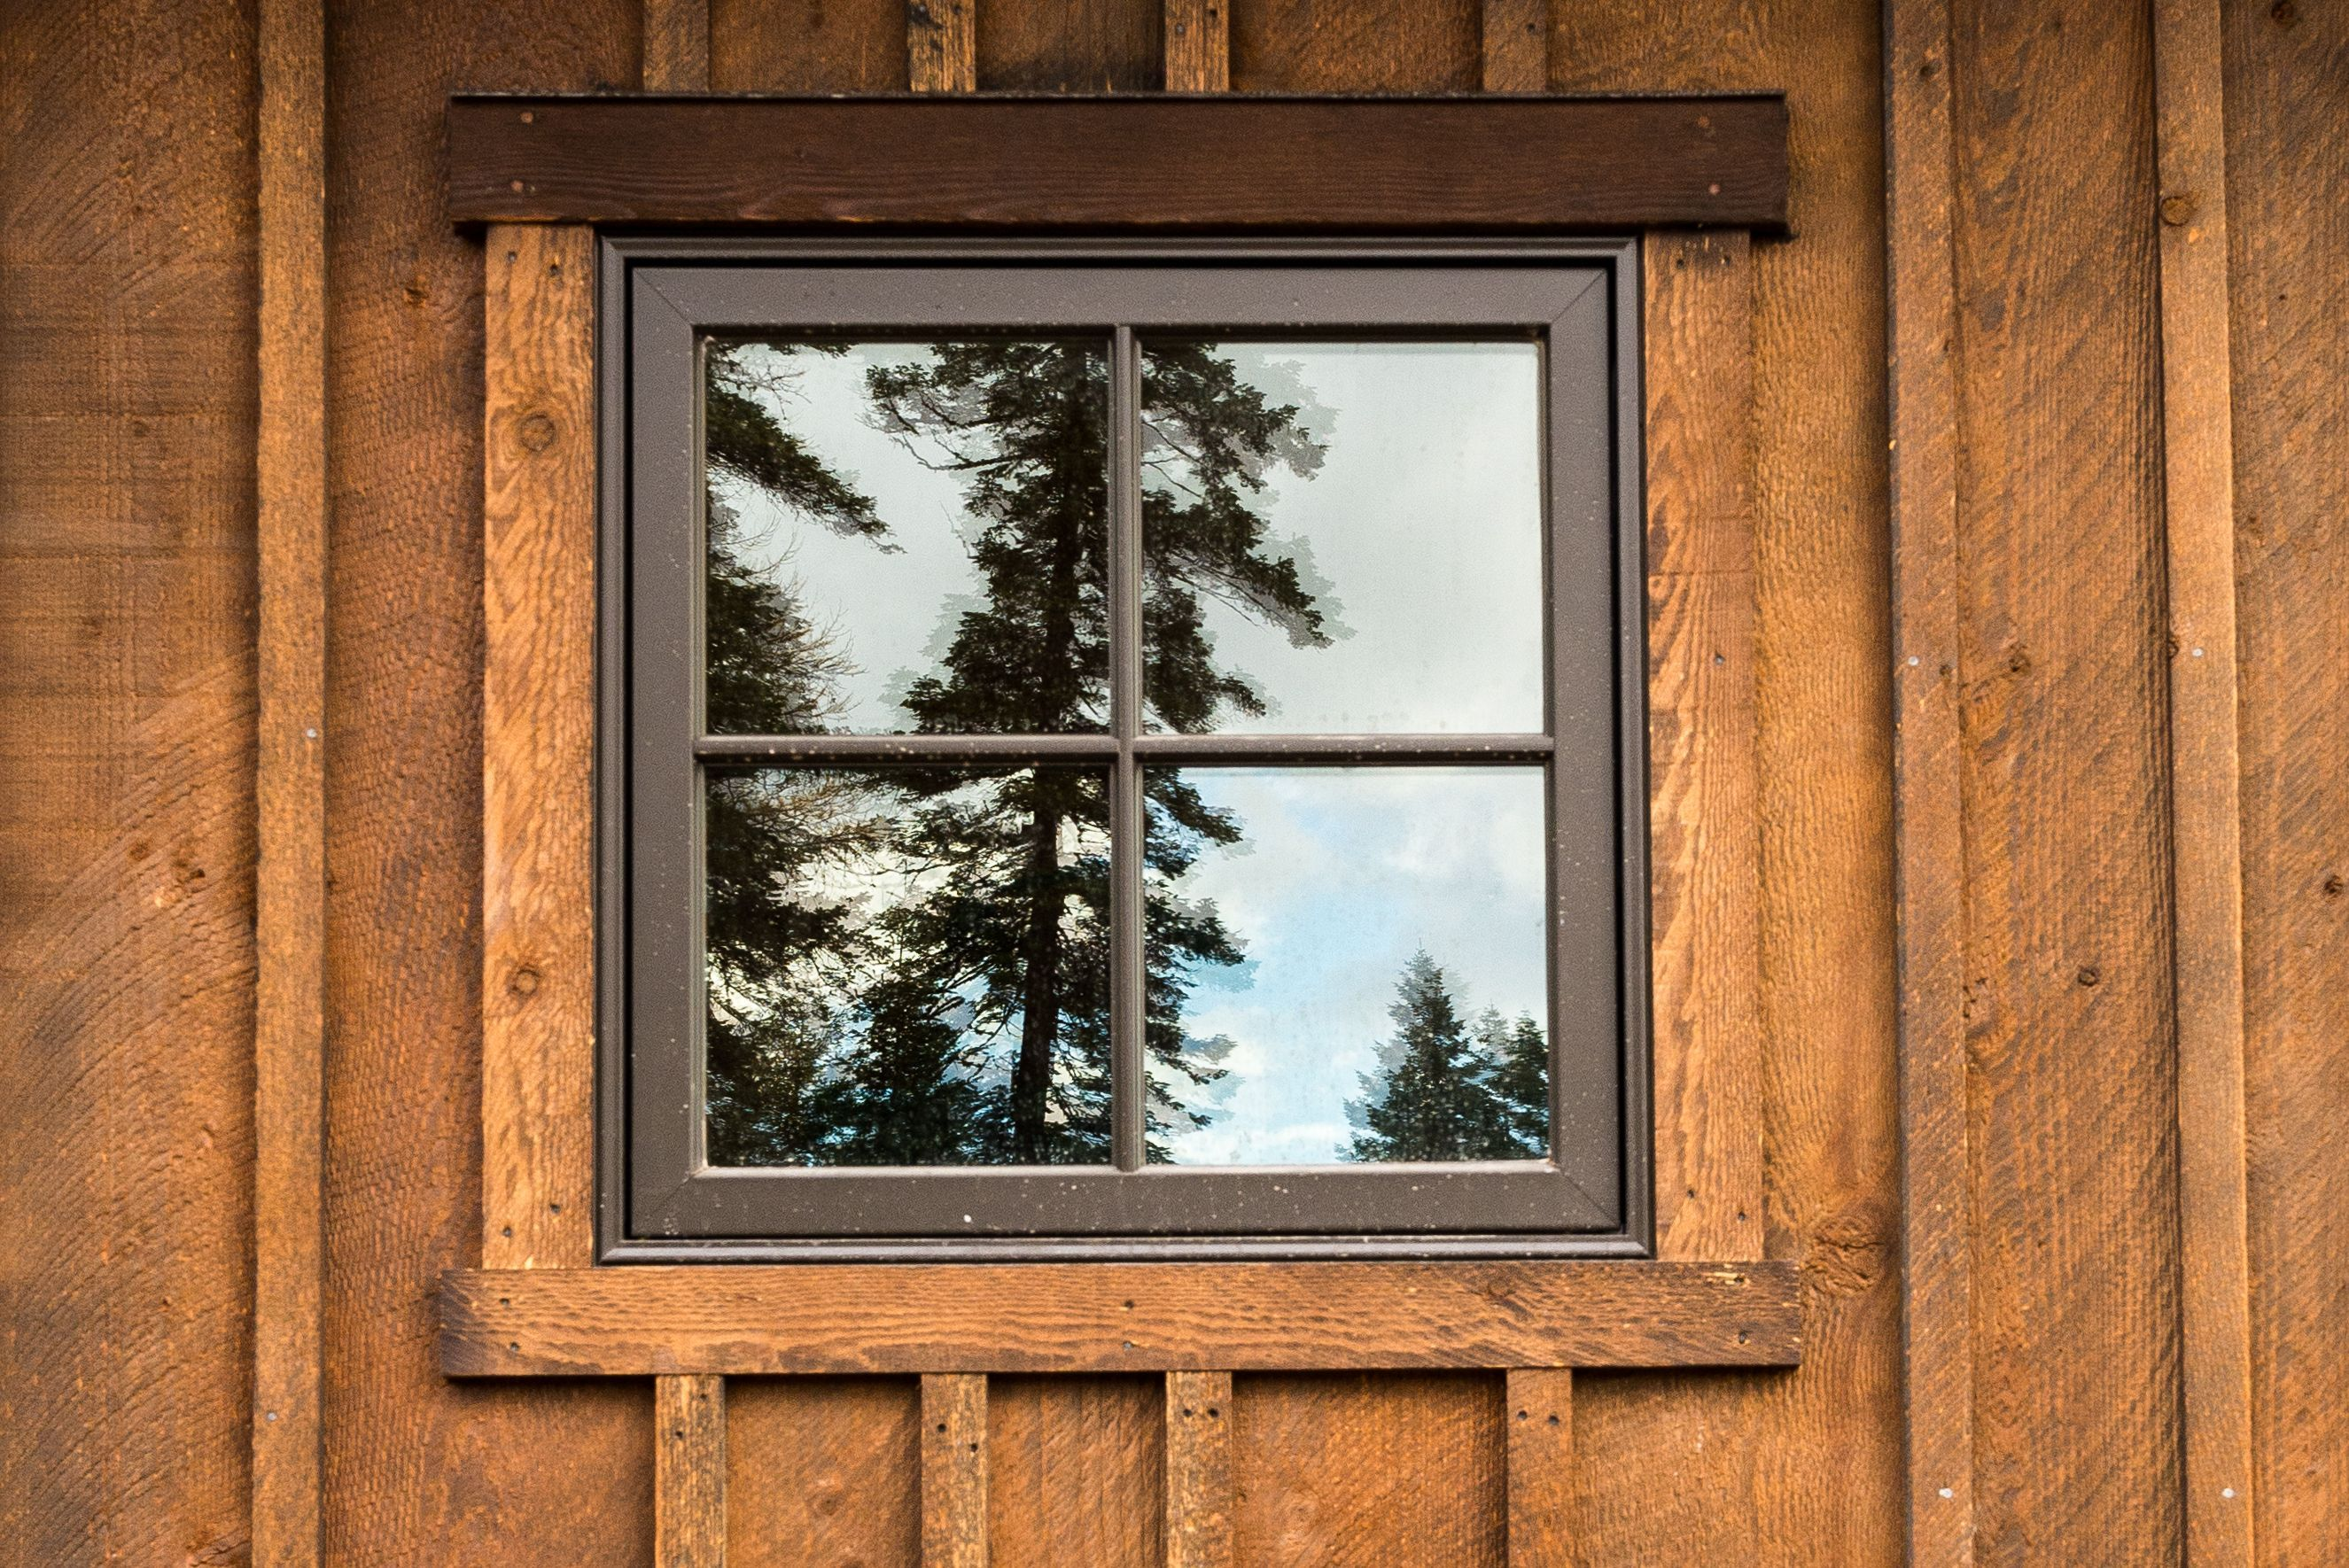 Ranchwood Siding And Timbers Boardandbattensiding Window Trim Exterior Rustic Exterior Wood Siding